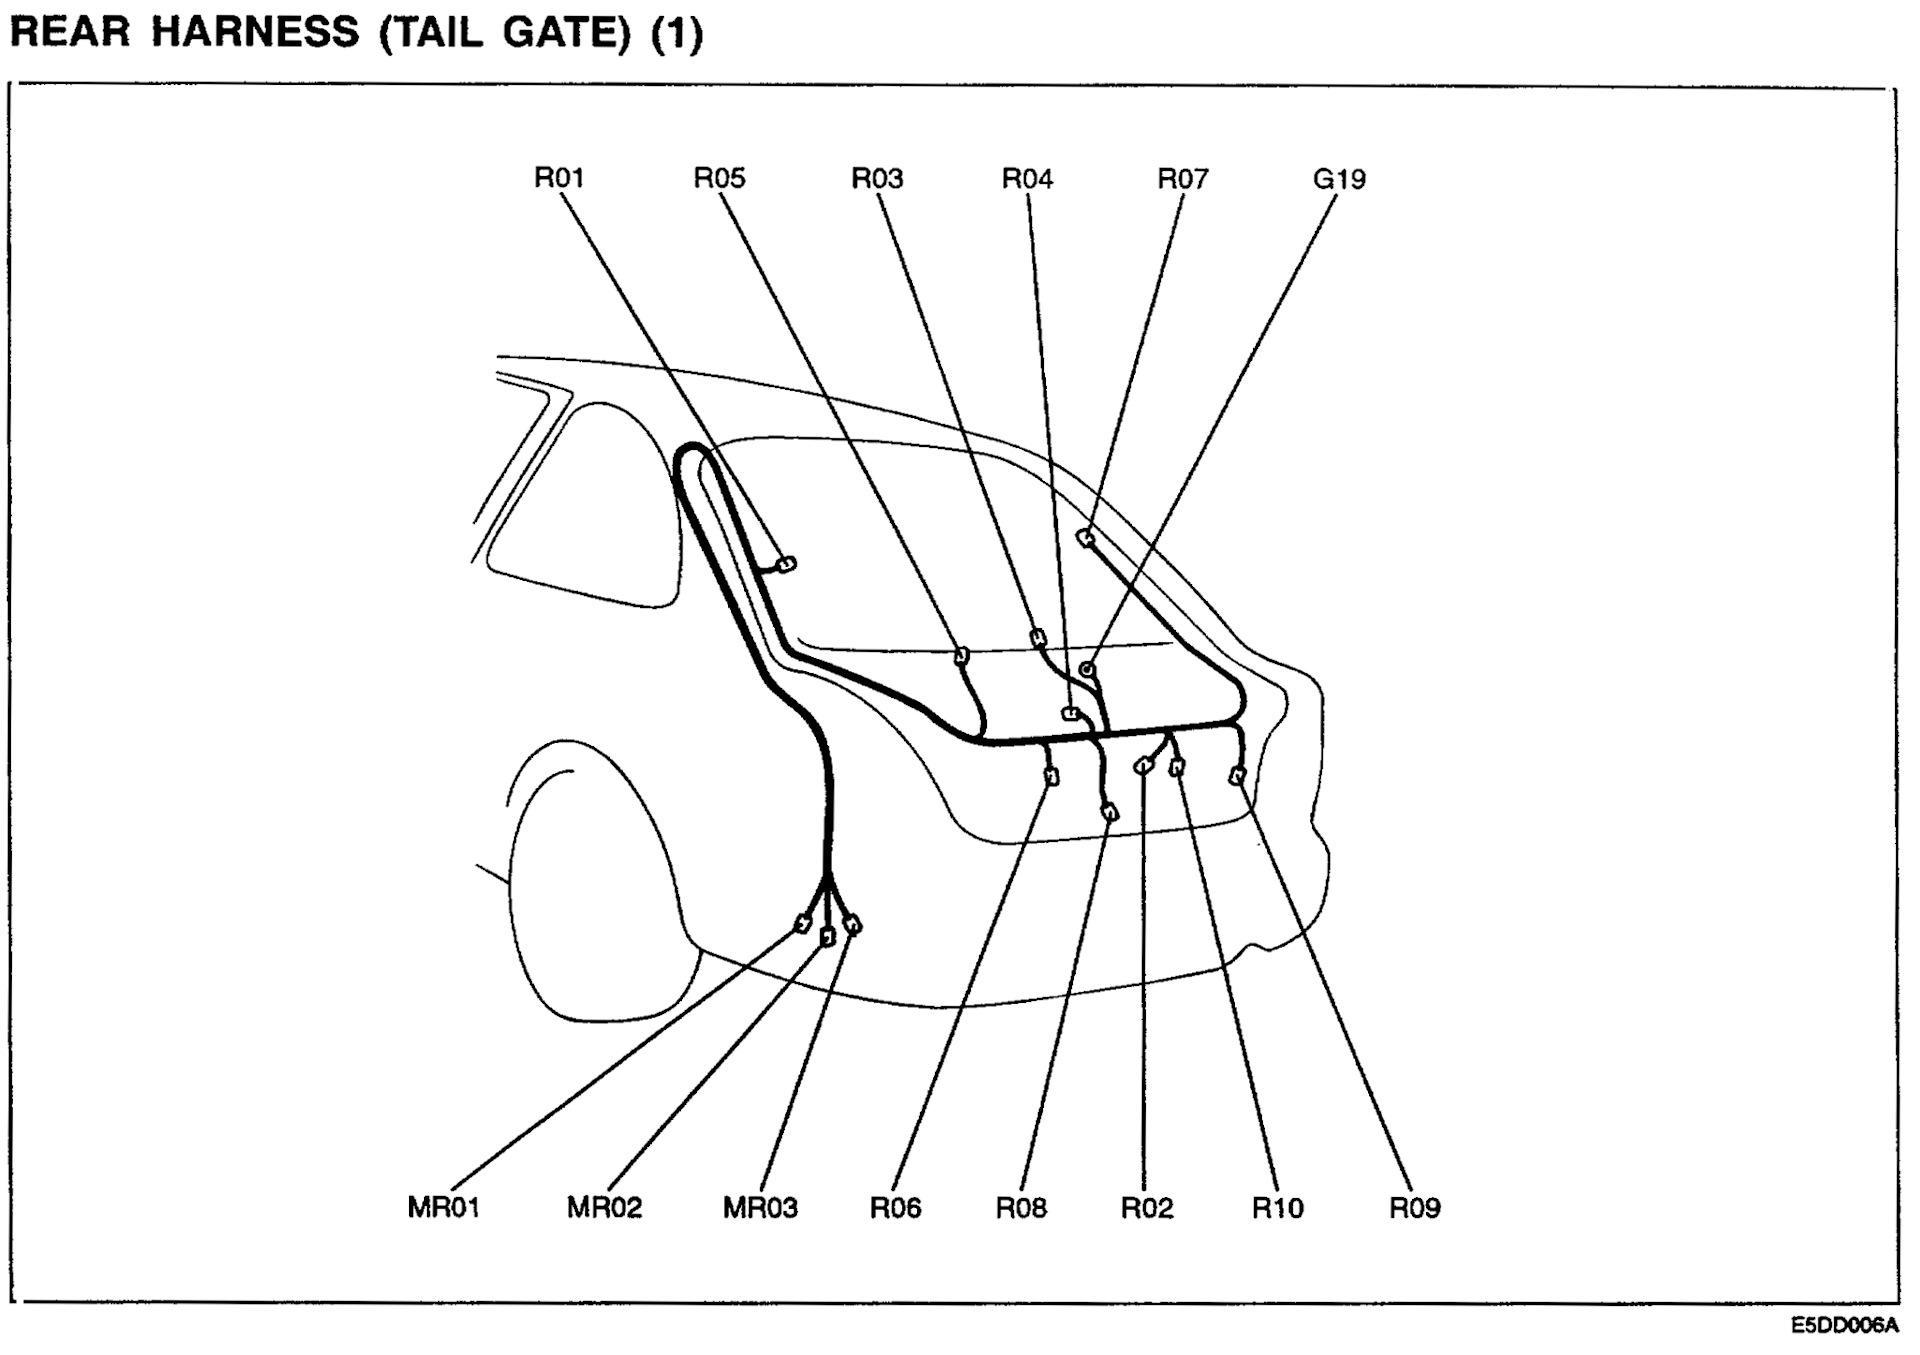 430 Engine Diagram Ramps Wiring Fan V1 4 Bobcat Scintillating Mercedes Electric Foil Dd5bcfes 1920 Diagramhtml